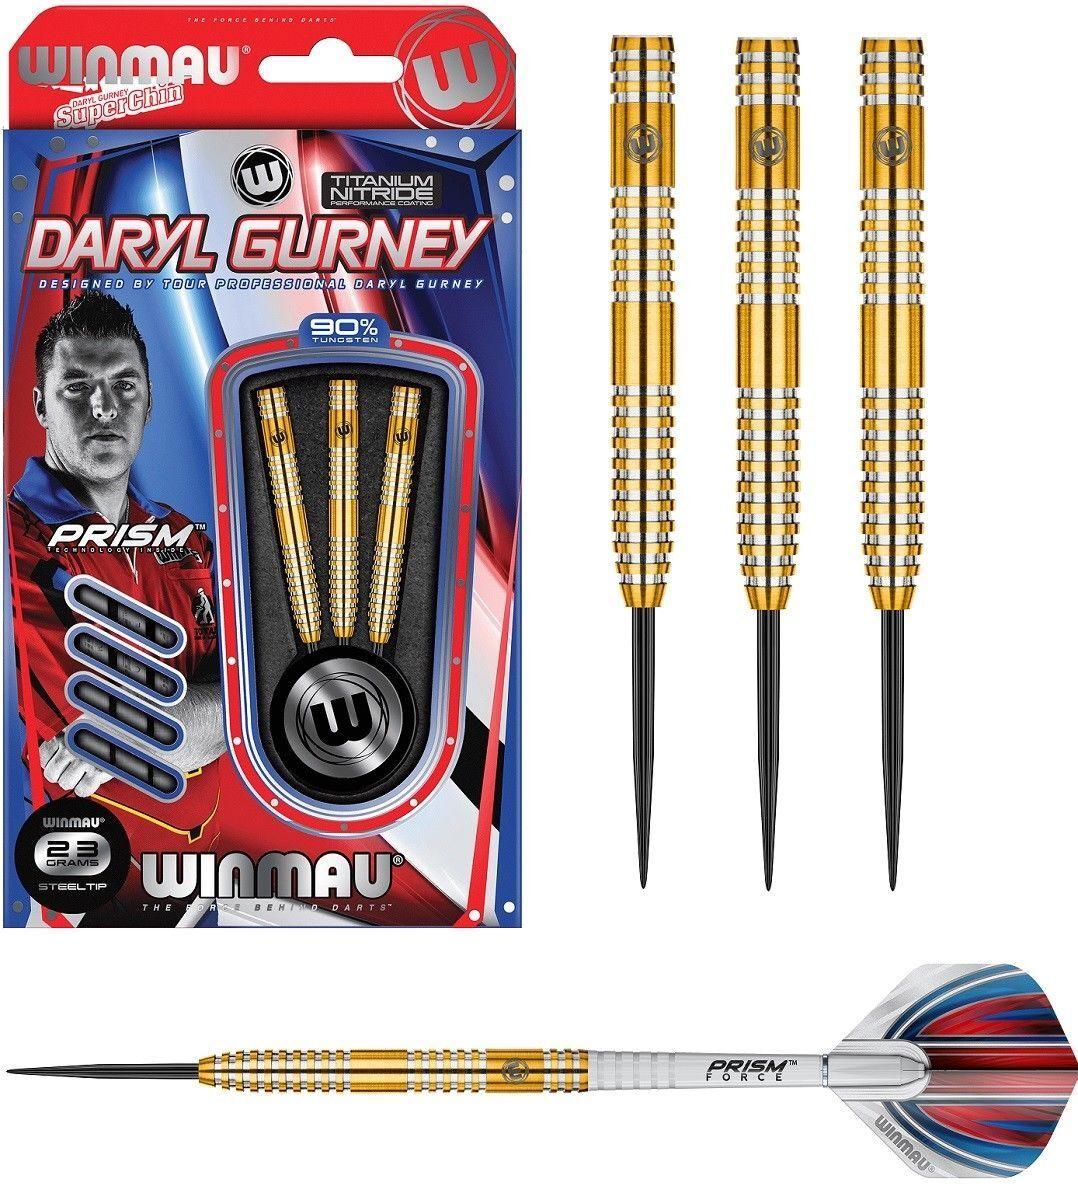 Daryl Gurney Signature Winmau Darts 23g Titanium Nitride Coating Flights & Stems